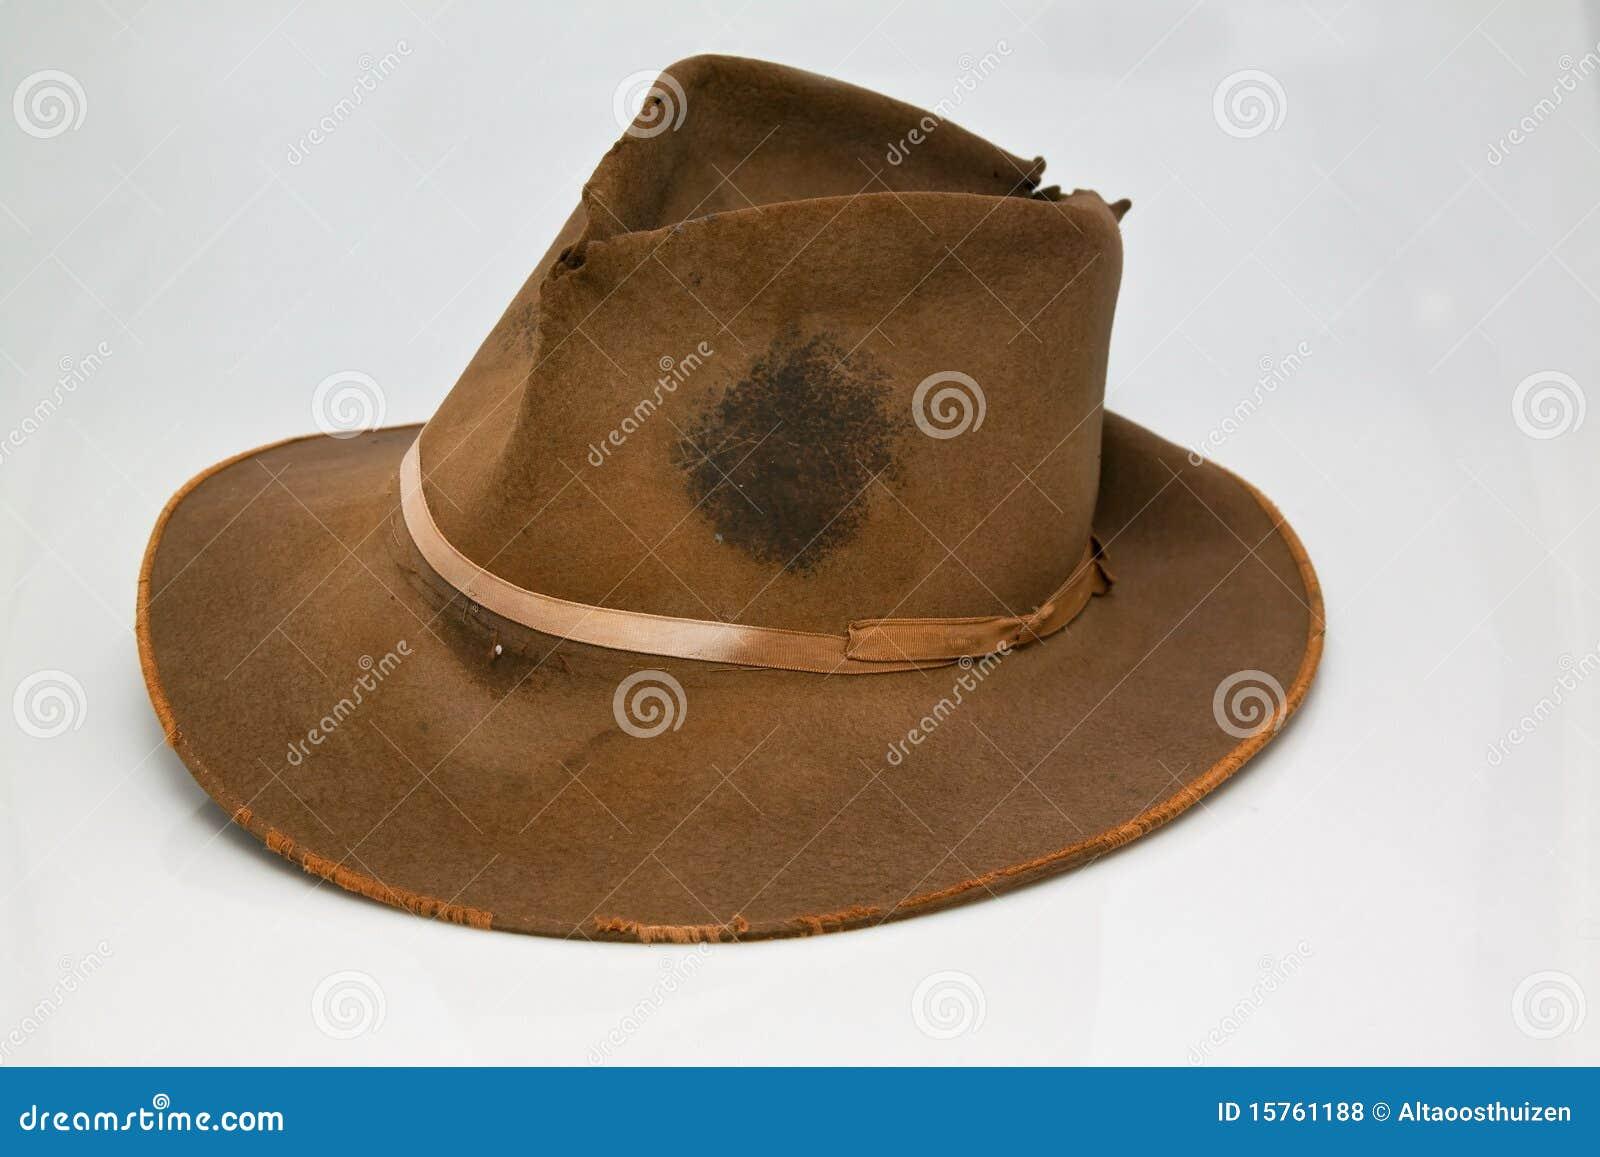 Old, Worn Brown Hat Stock Photo. Image Of Brim, Rugged